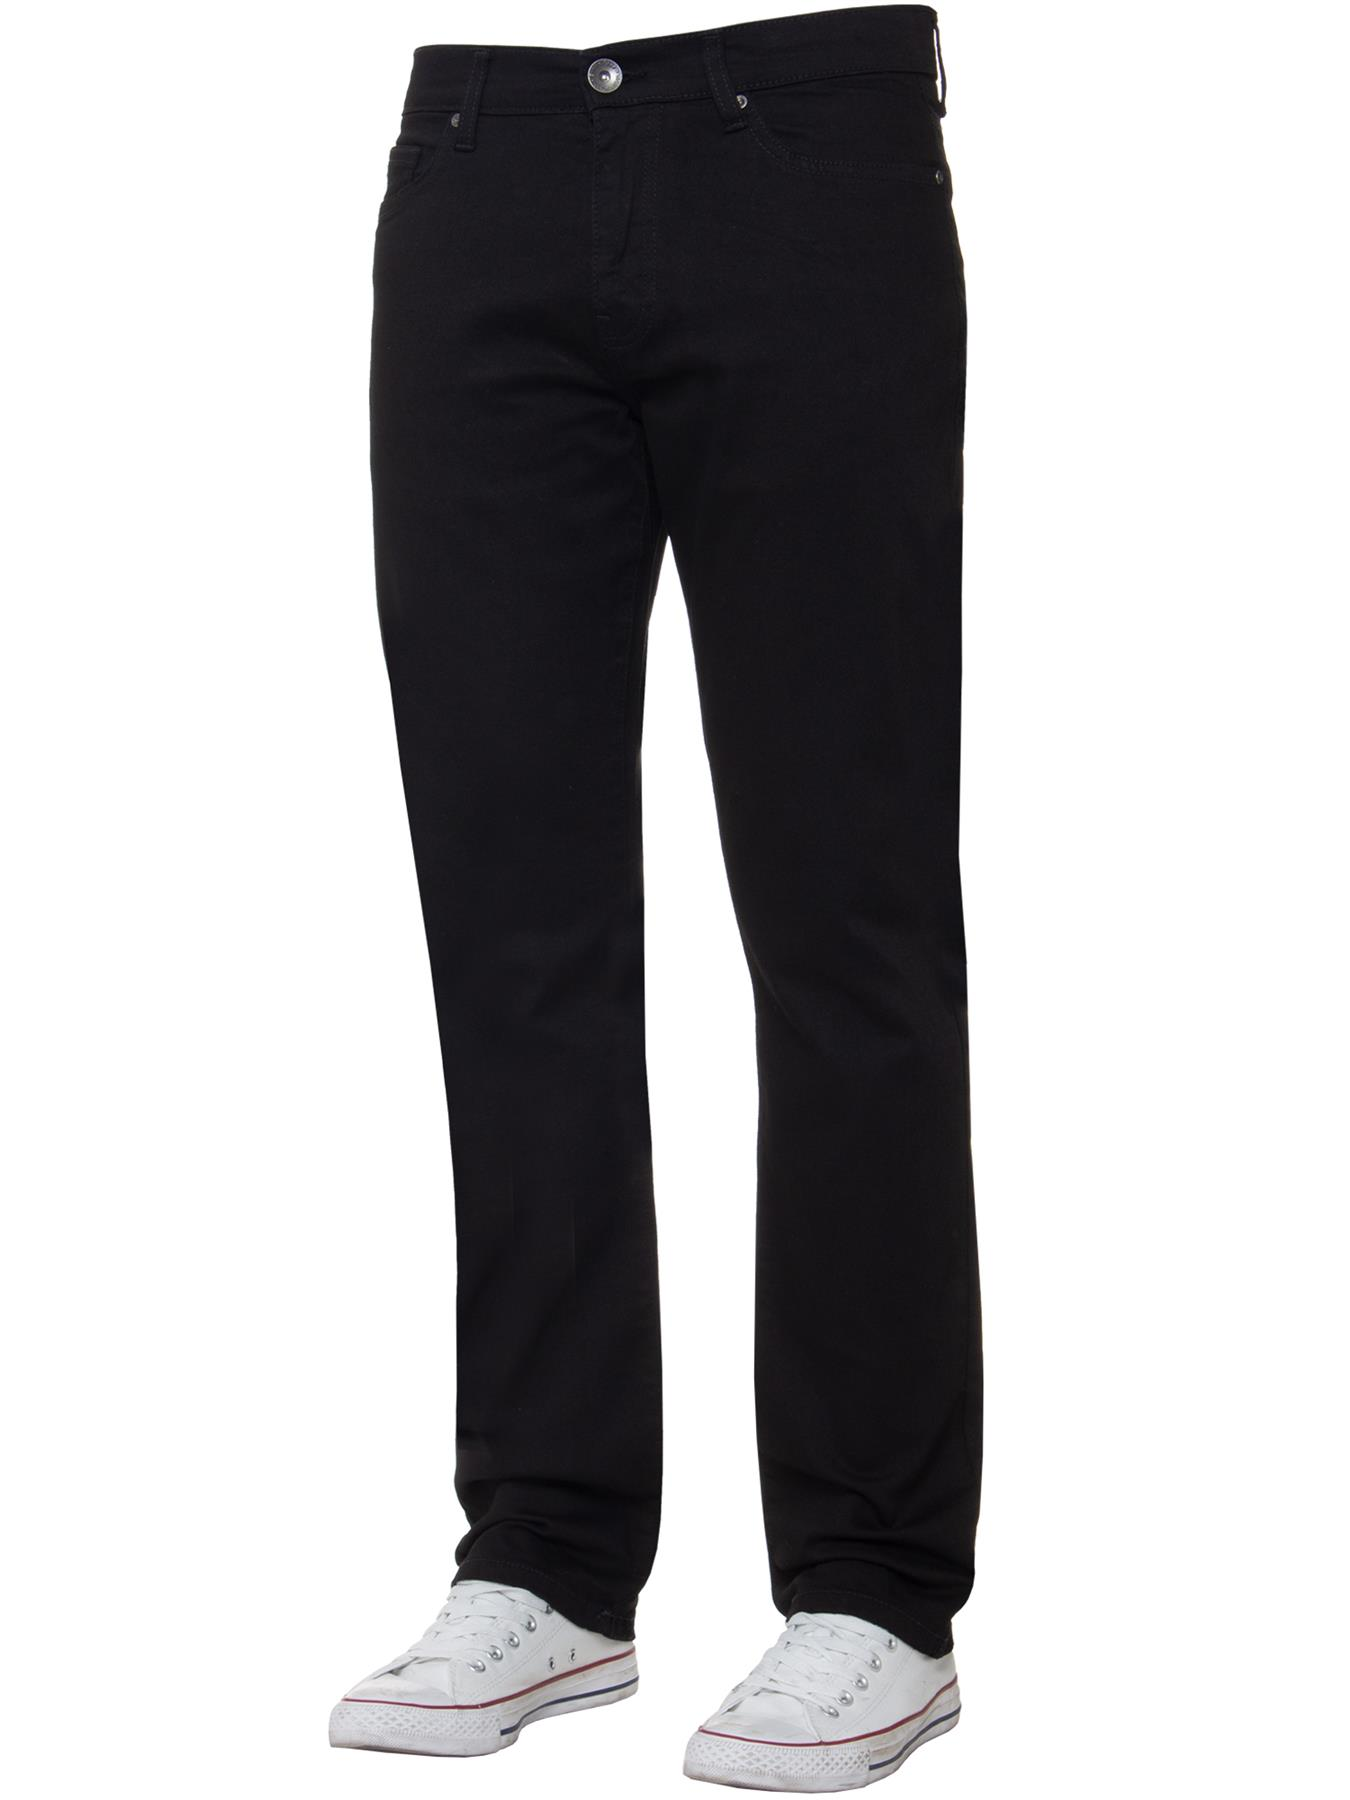 Para-Hombre-Pierna-Recta-Bootcut-Stretch-Denim-Regulares-Pantalon-de-trabajo-Kruze-Todas-Cinturas miniatura 21